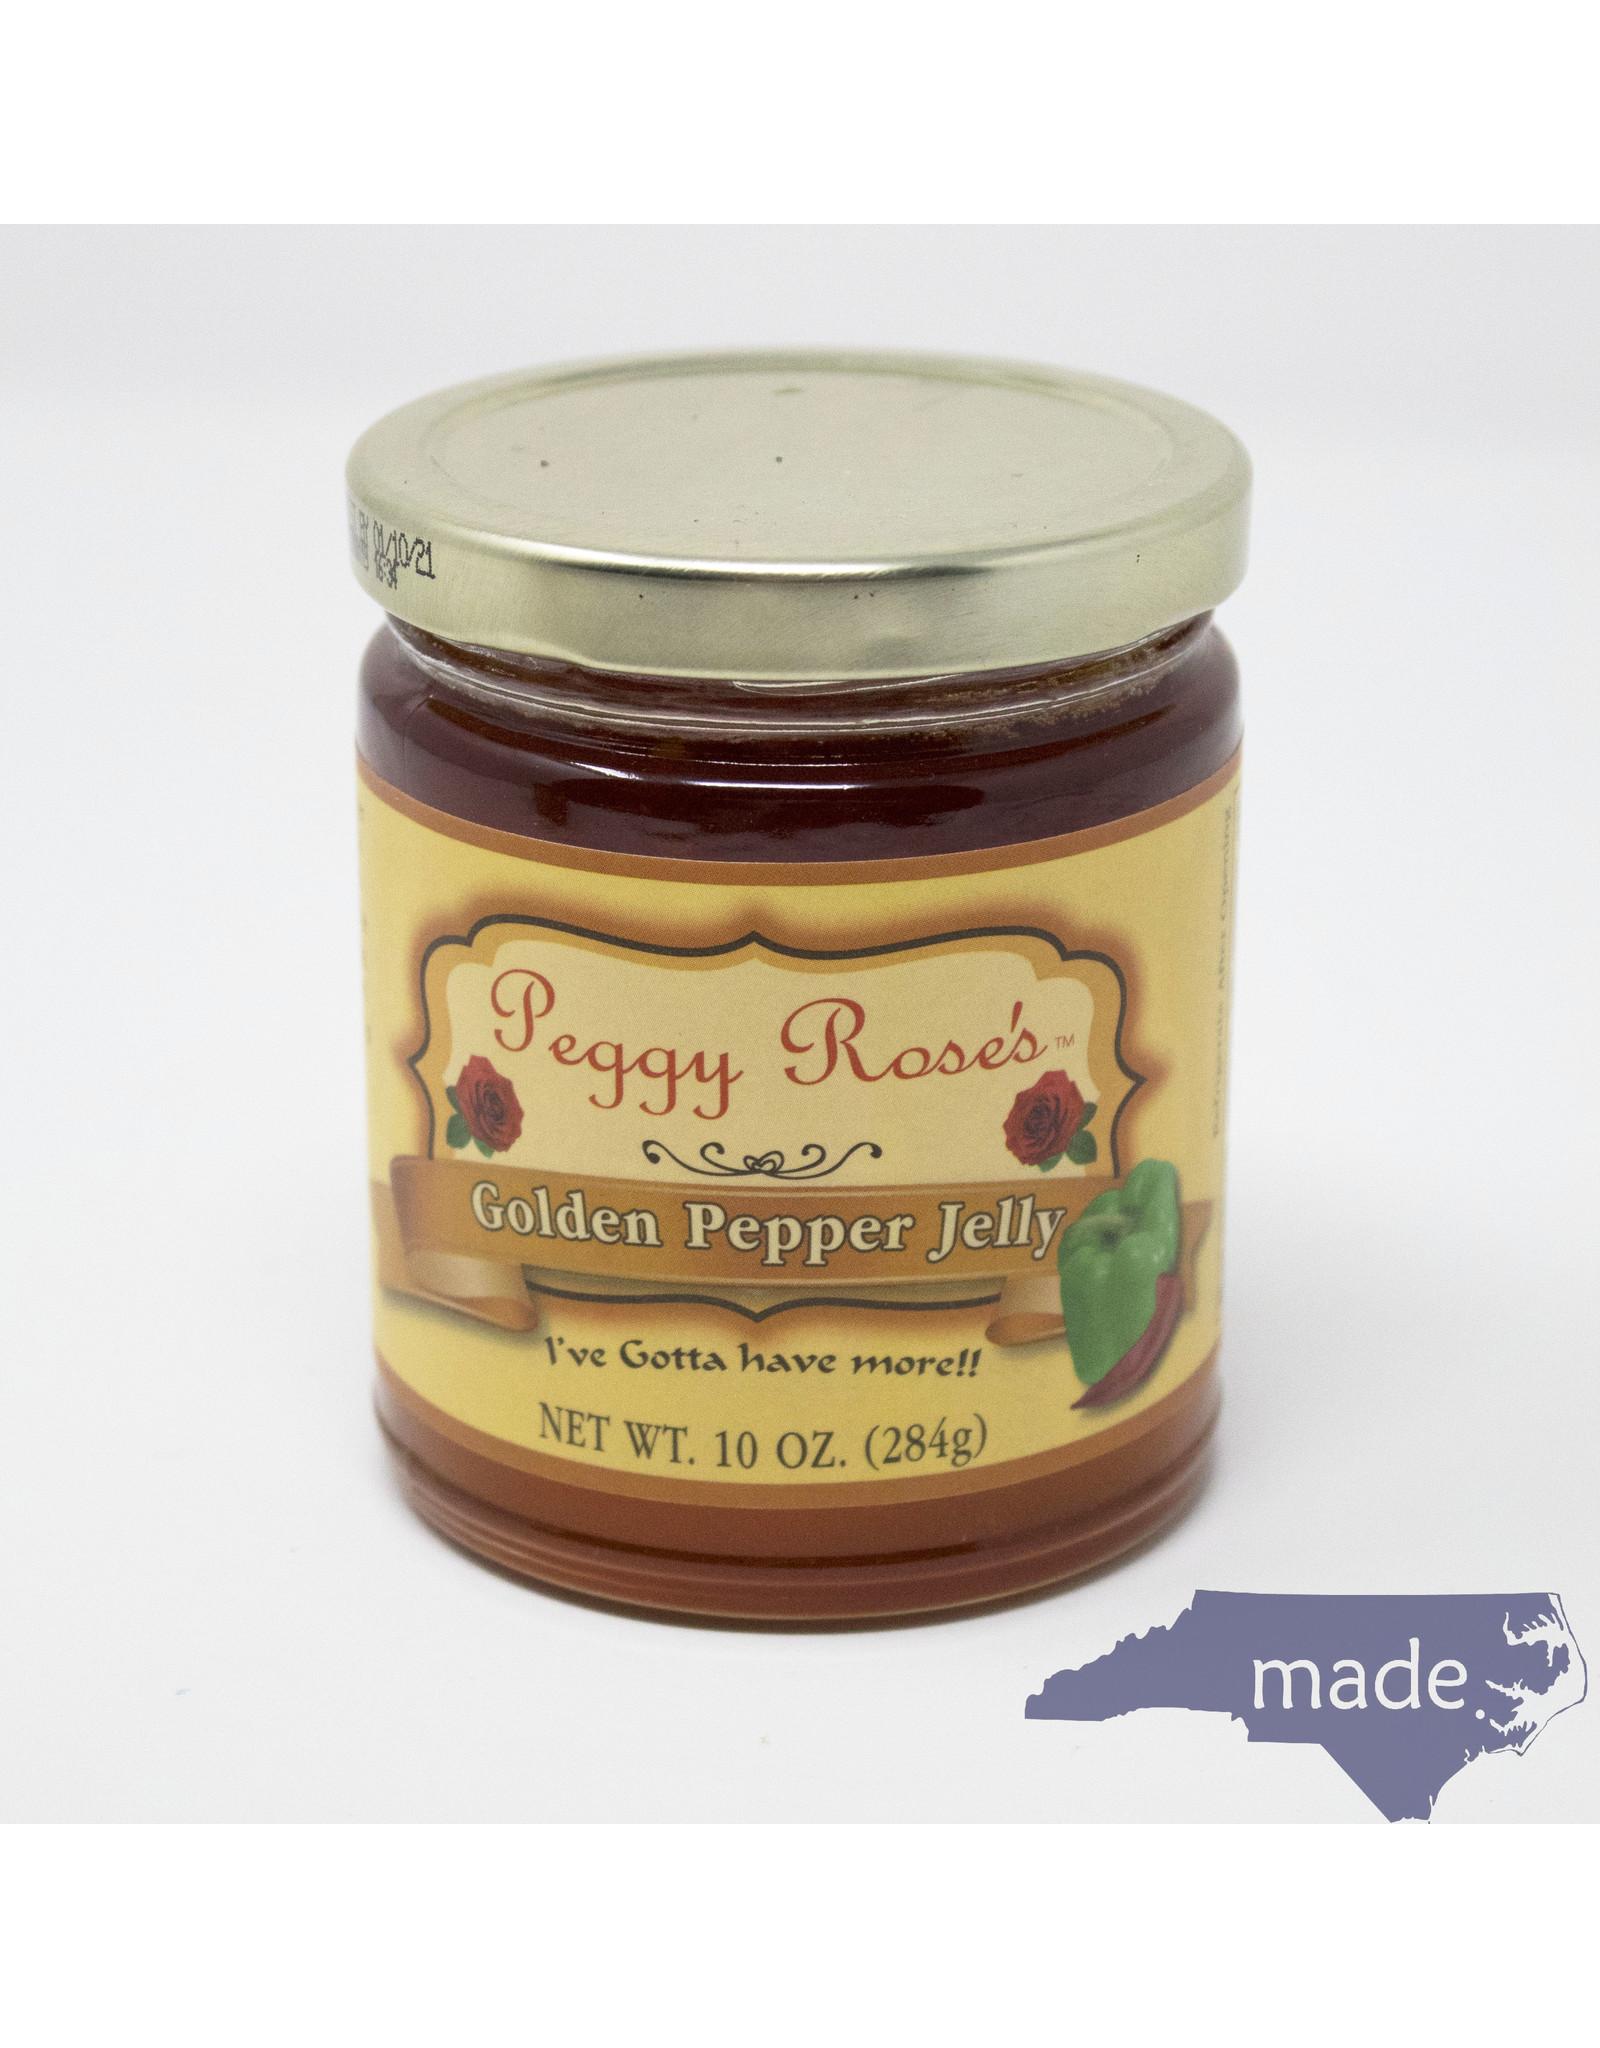 Peggy Rose's Golden Pepper Jelly - Peggy Rose's